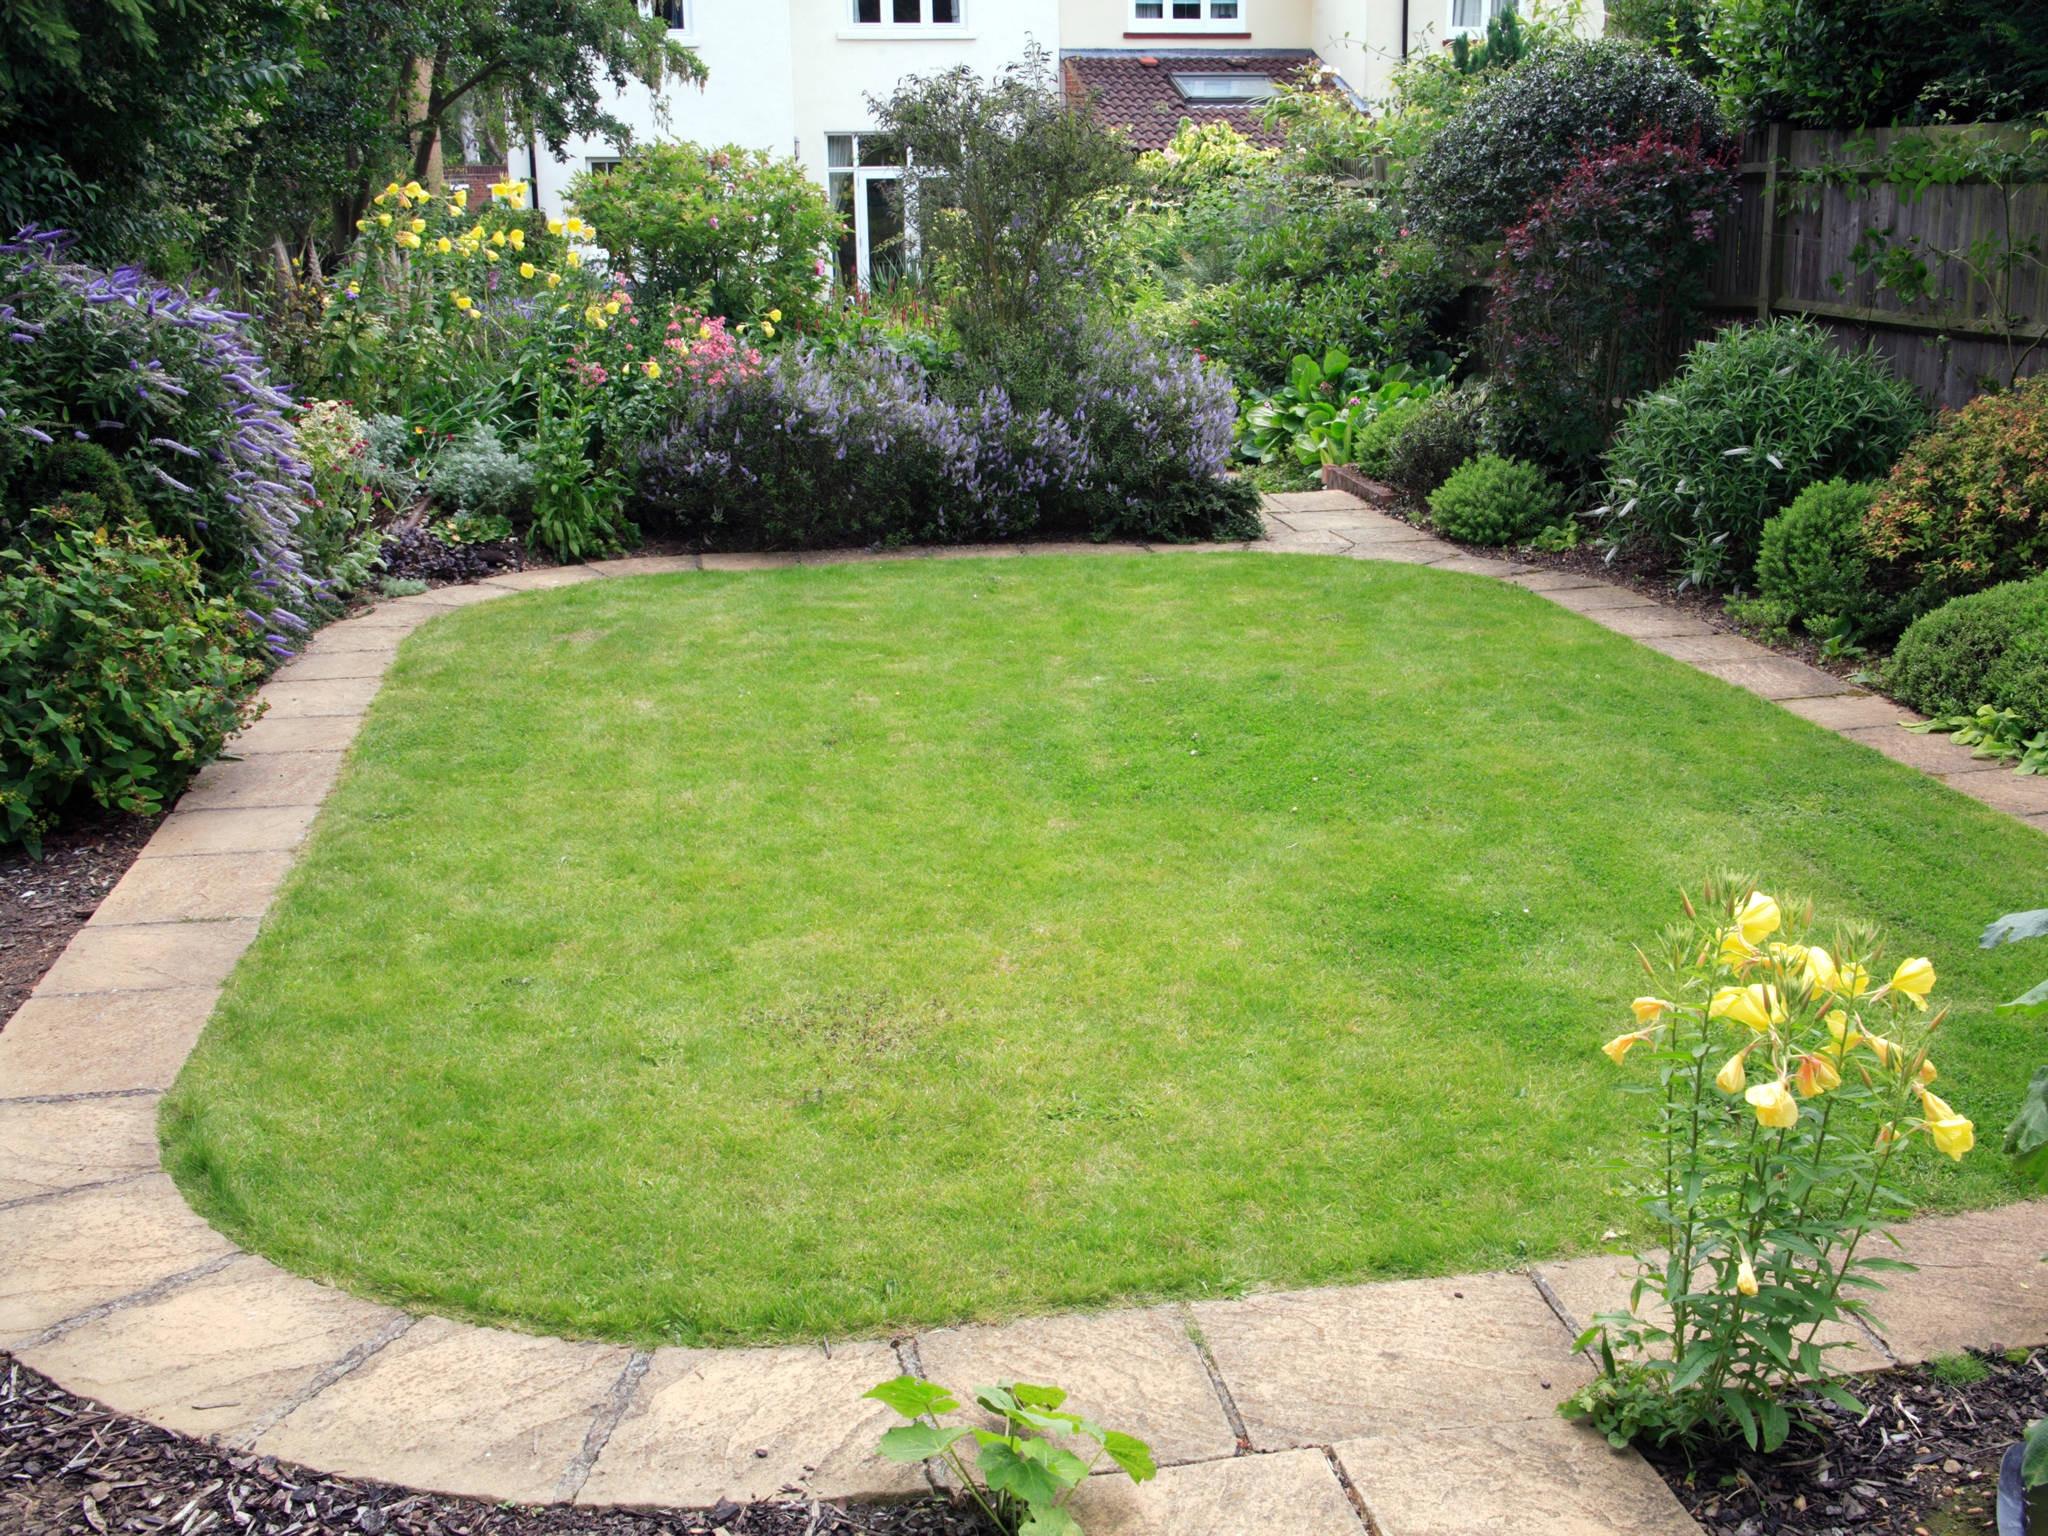 Best ideas about Home Depot Landscape Edging . Save or Pin Decor Home Depot Edging Landscape Edging Ideas Now.